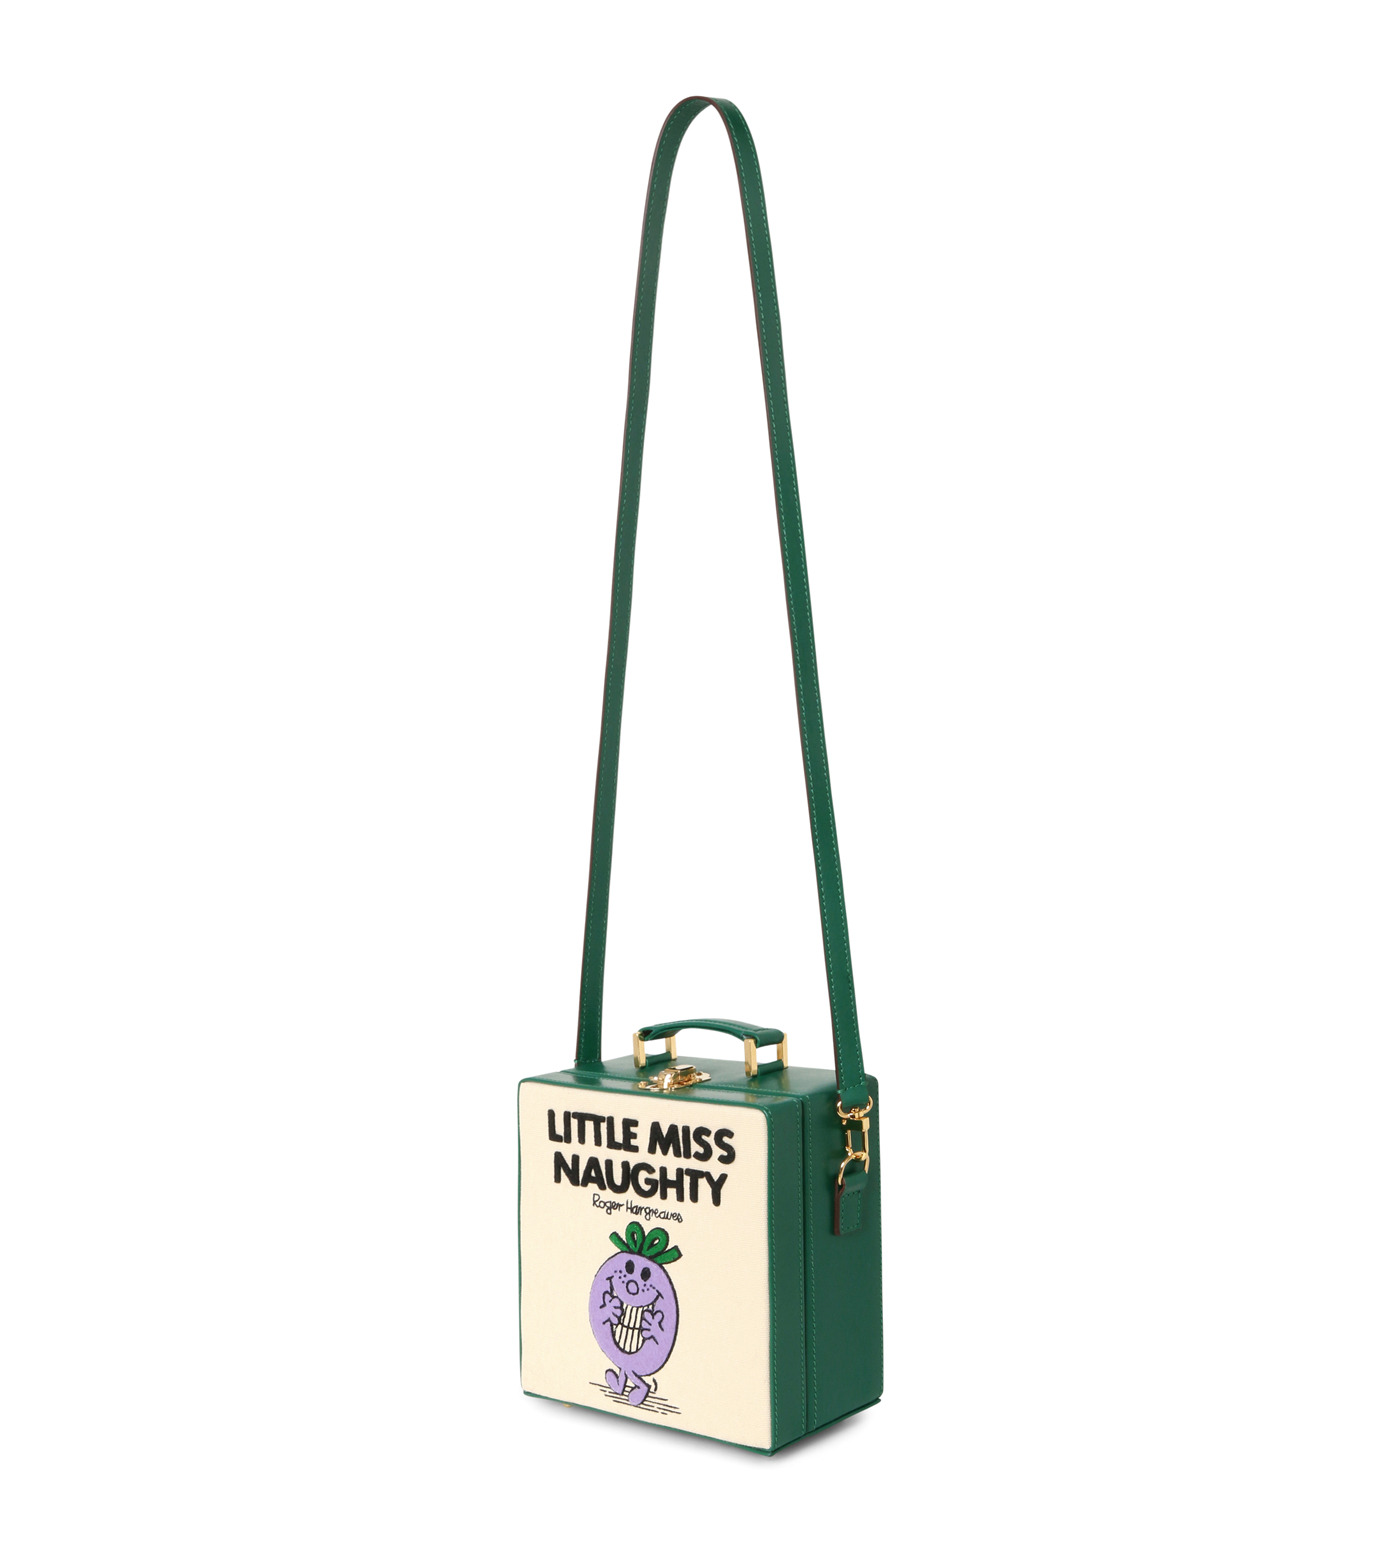 Olympia Le-Tan(オリンピア ルタン)のLittle Miss Naughty 7-Inch-WHITE(ショルダーバッグ/shoulder bag)-FW16B7I007-5 拡大詳細画像2